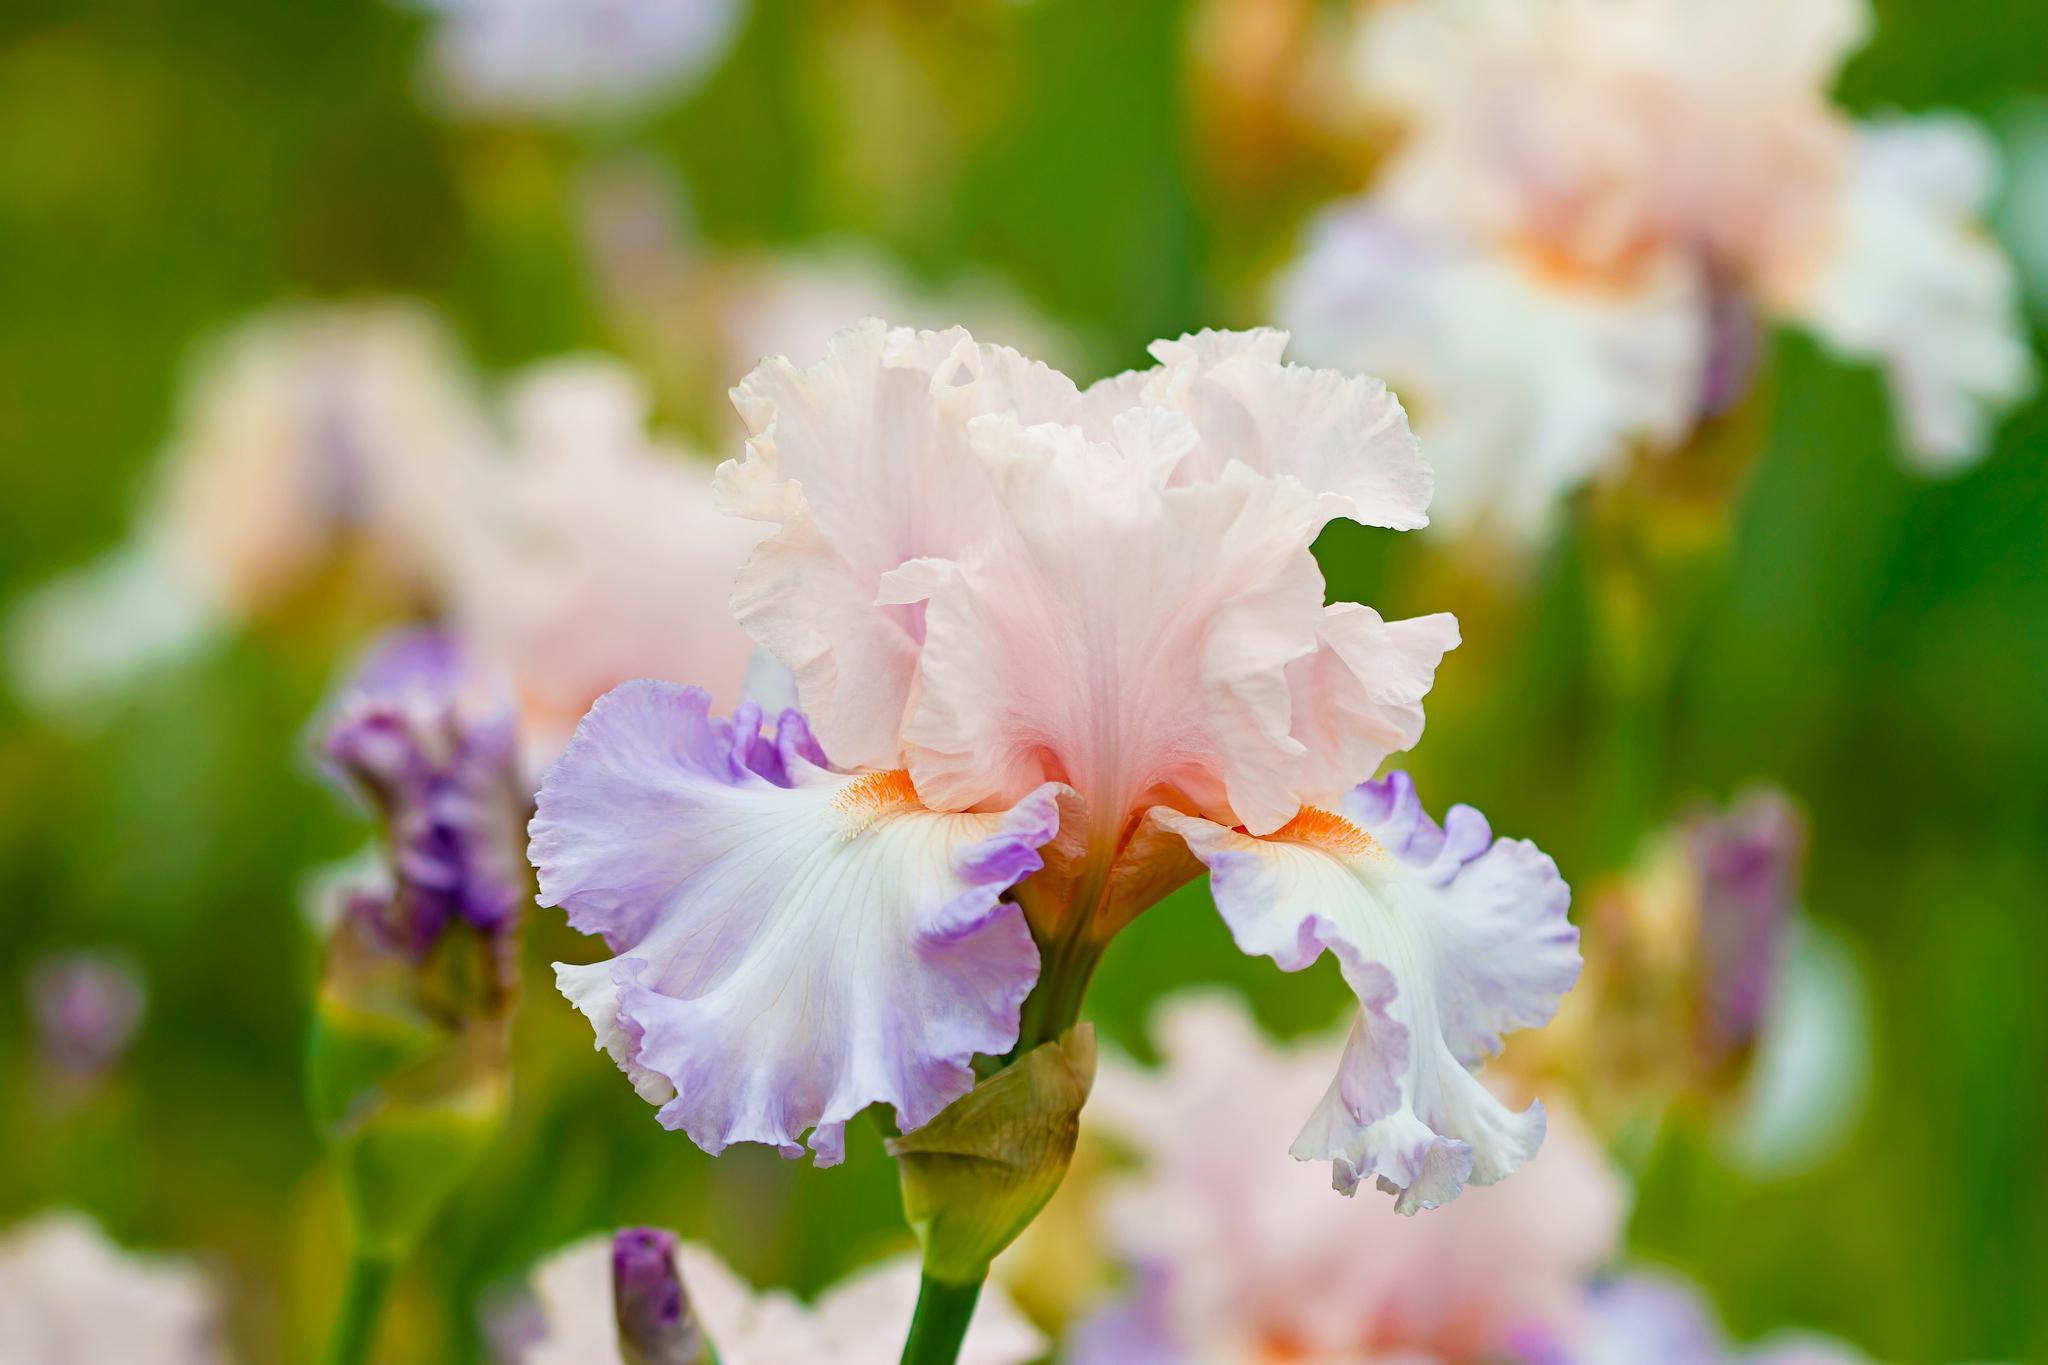 шмель,ирис,цветок,лето  № 529531 бесплатно